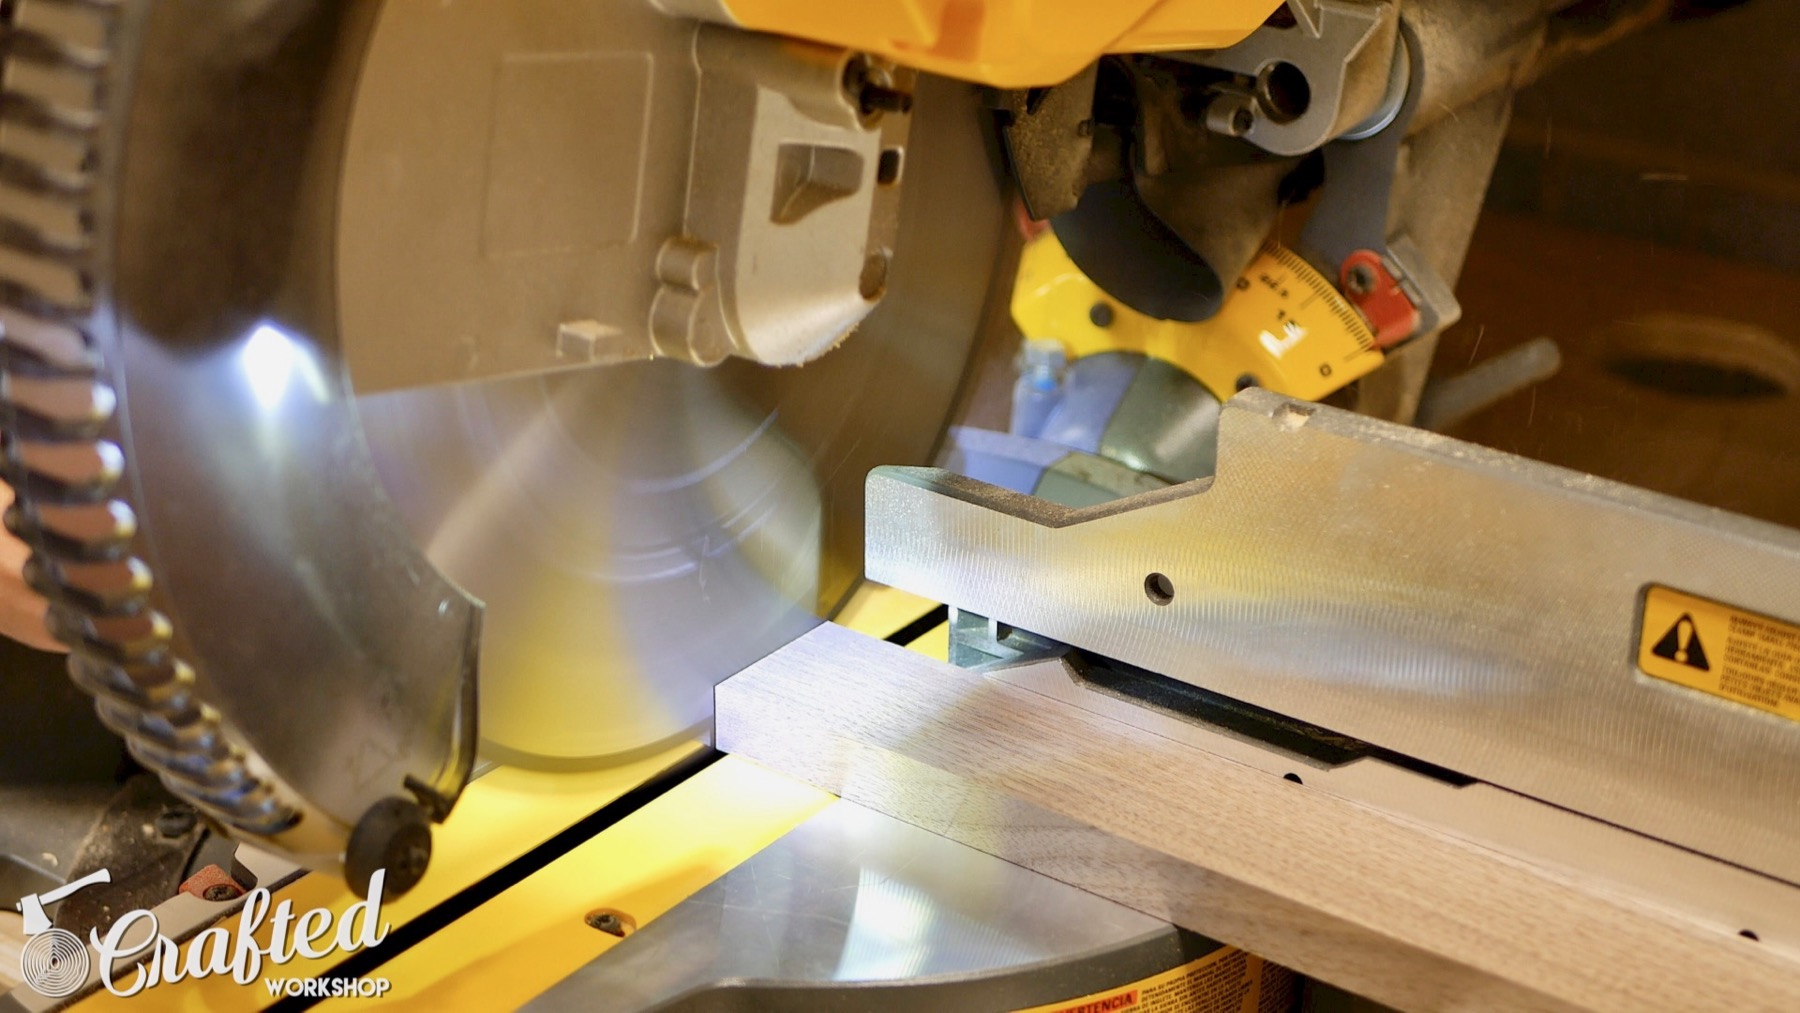 DIY Light Box Sign How-To Build dewalt flexvolt miter saw walnut